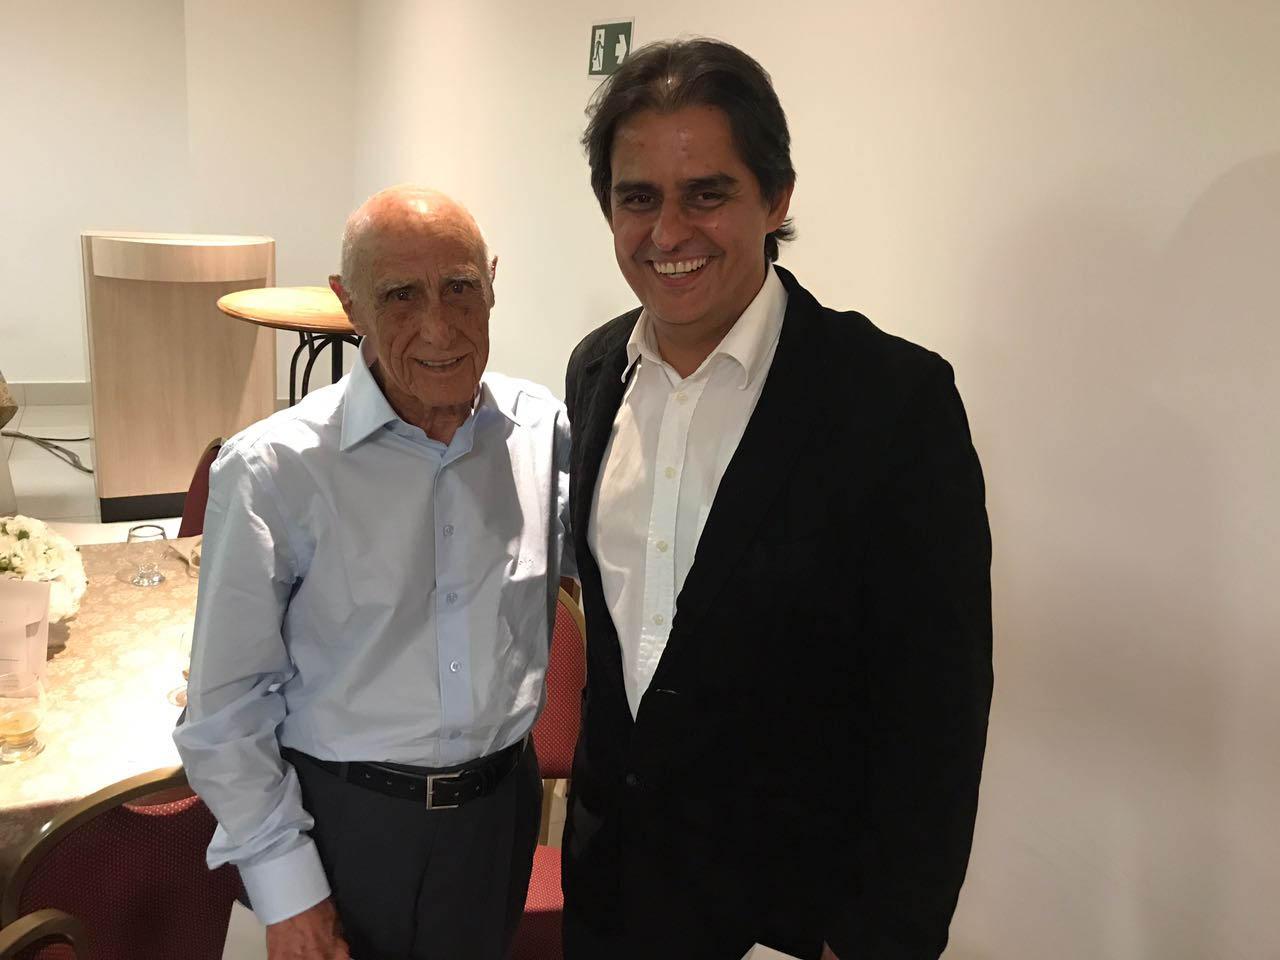 Dia do Médico, 18 de outubro de 2017: Dr. Colombo recebe medalha entregue pelo ortopedista Dr. Édson Pereira Lima, diretor-clínico do HNSD